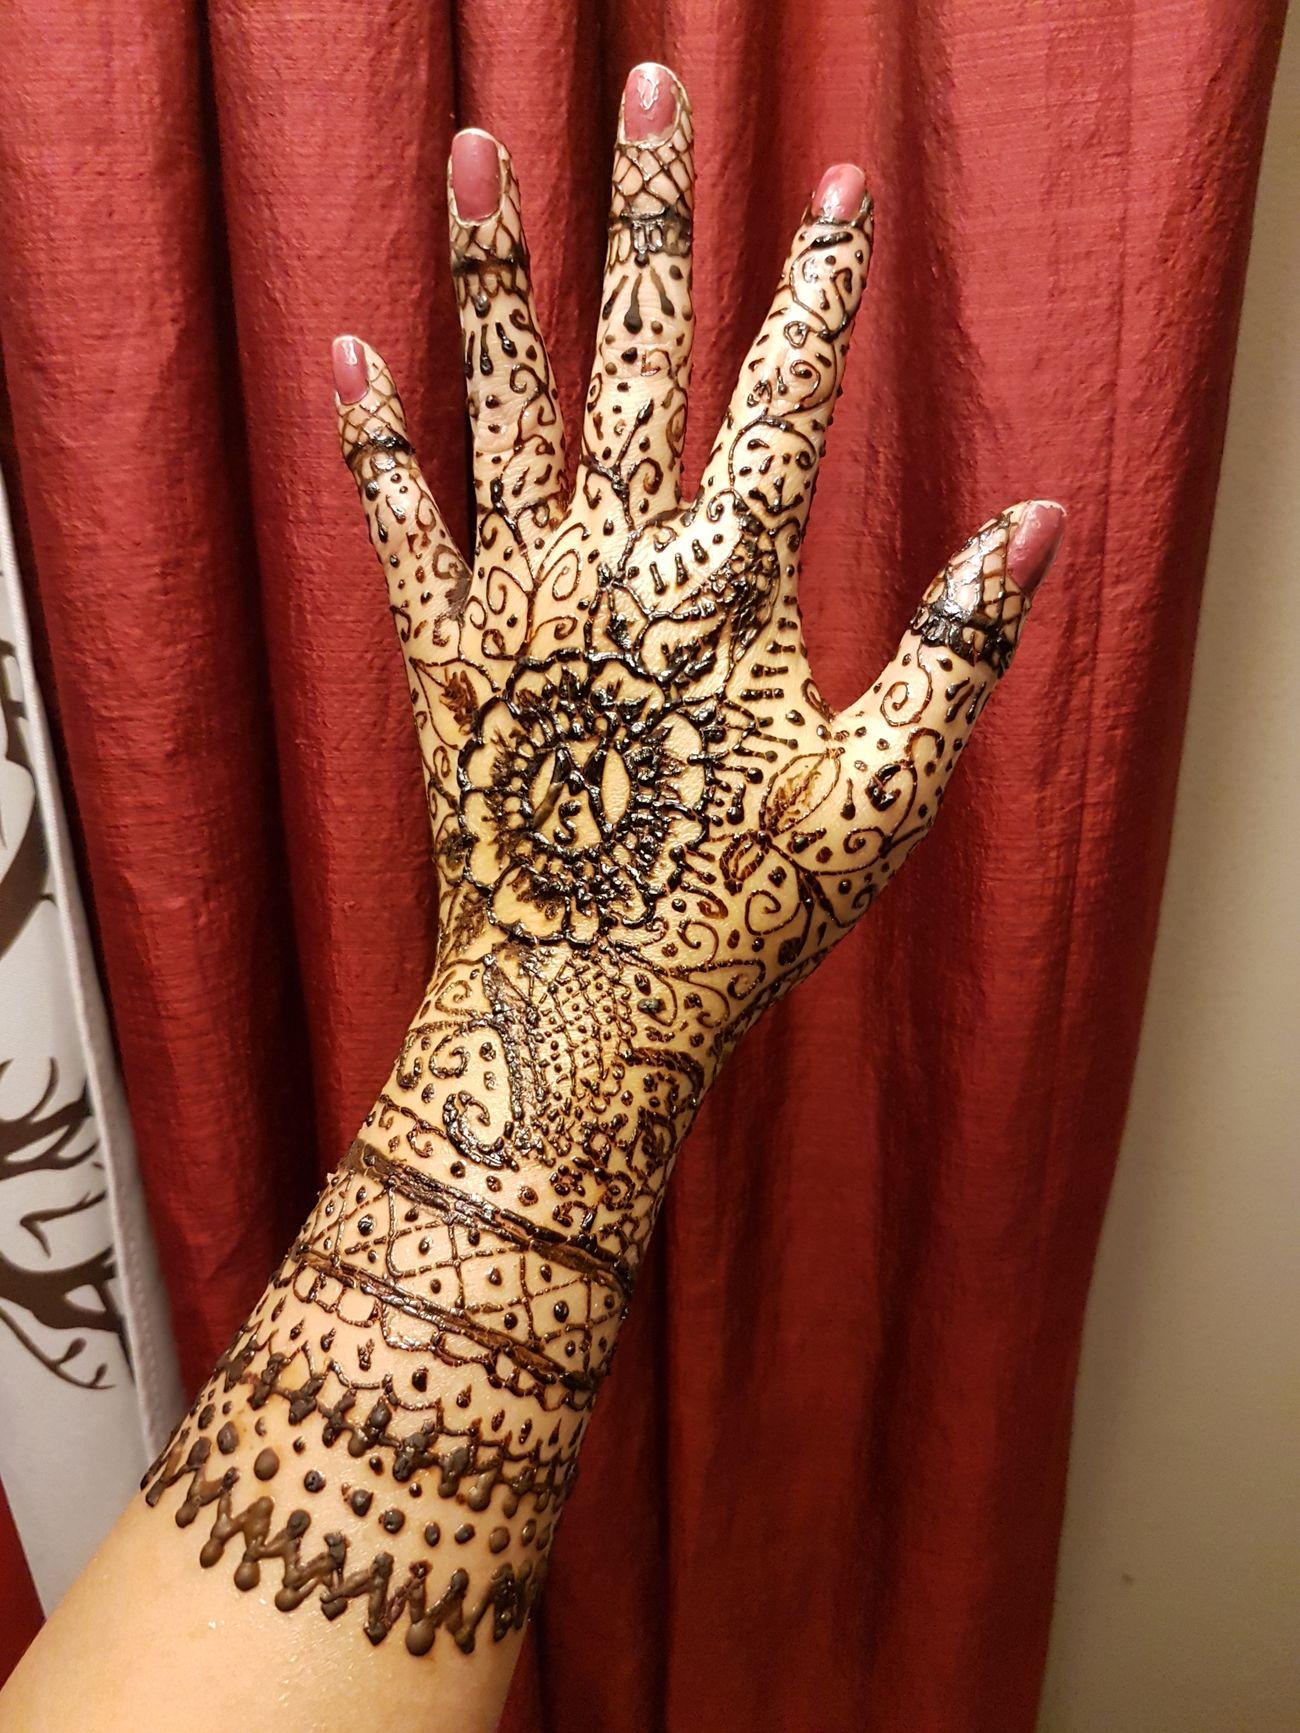 Red Human Skin Human Finger Culture Punjabiculture Punjabistyle Design Creativity Henna Tattoo Art And Craft Mehndi MehndiDesign MehndiTattoos